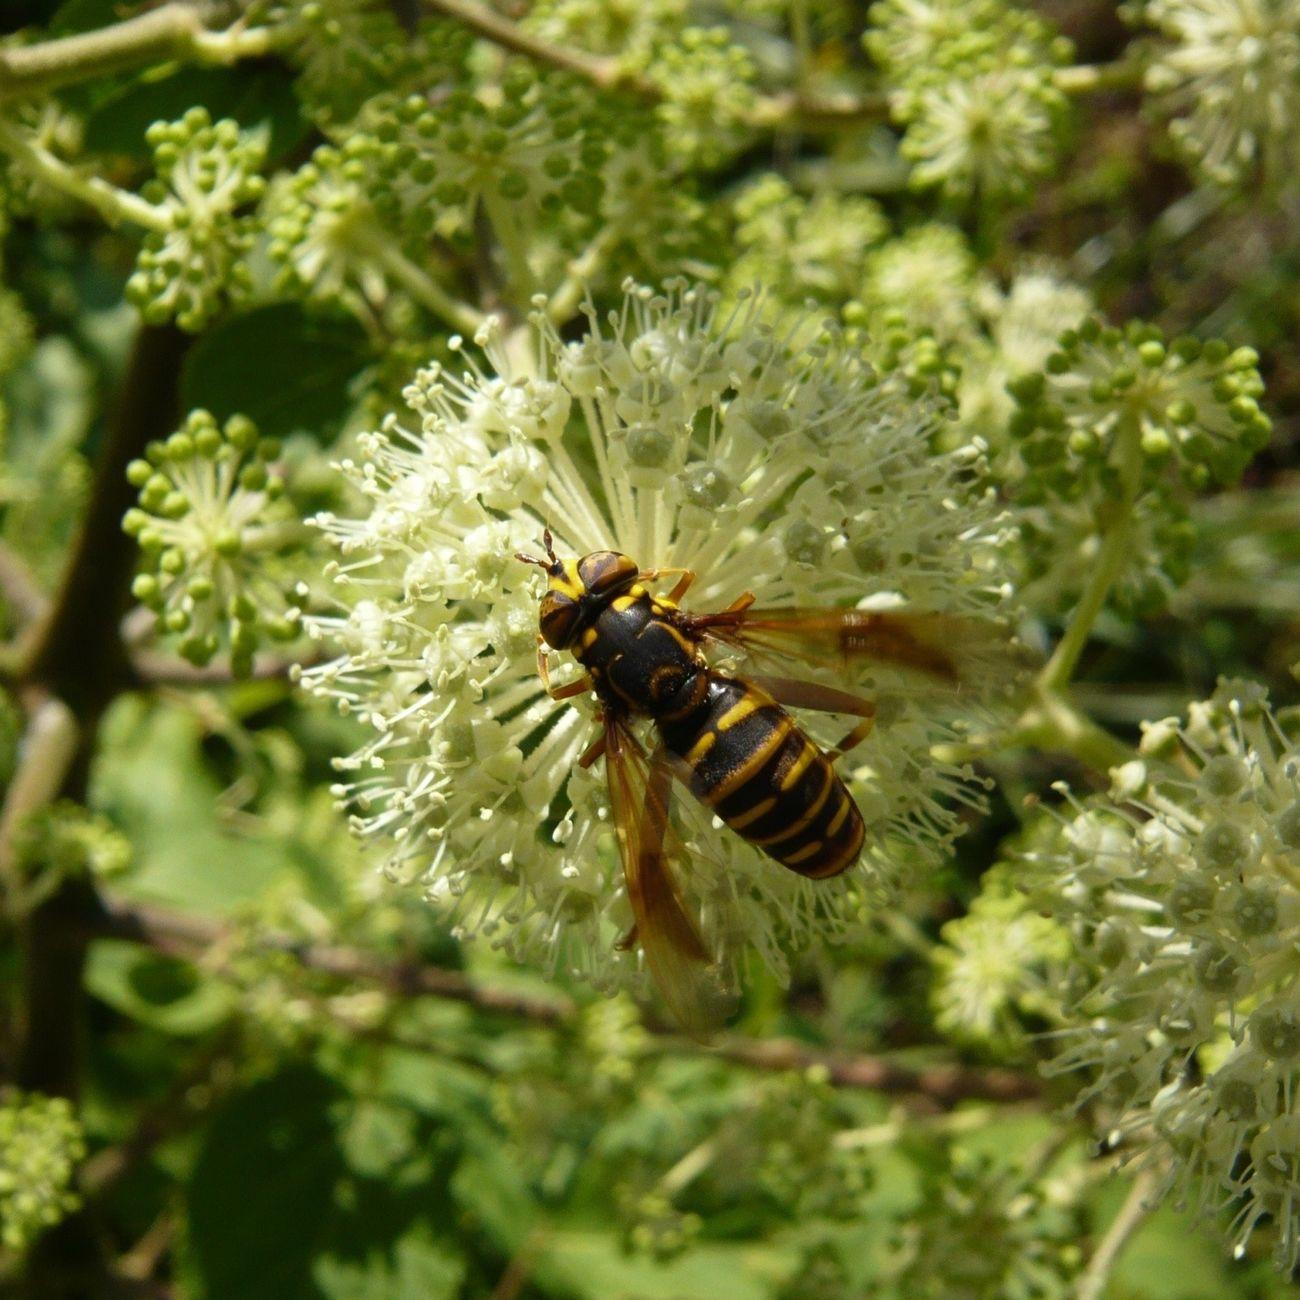 _Spilomyia suzukii_ Flowerfly Insect Udo Nature